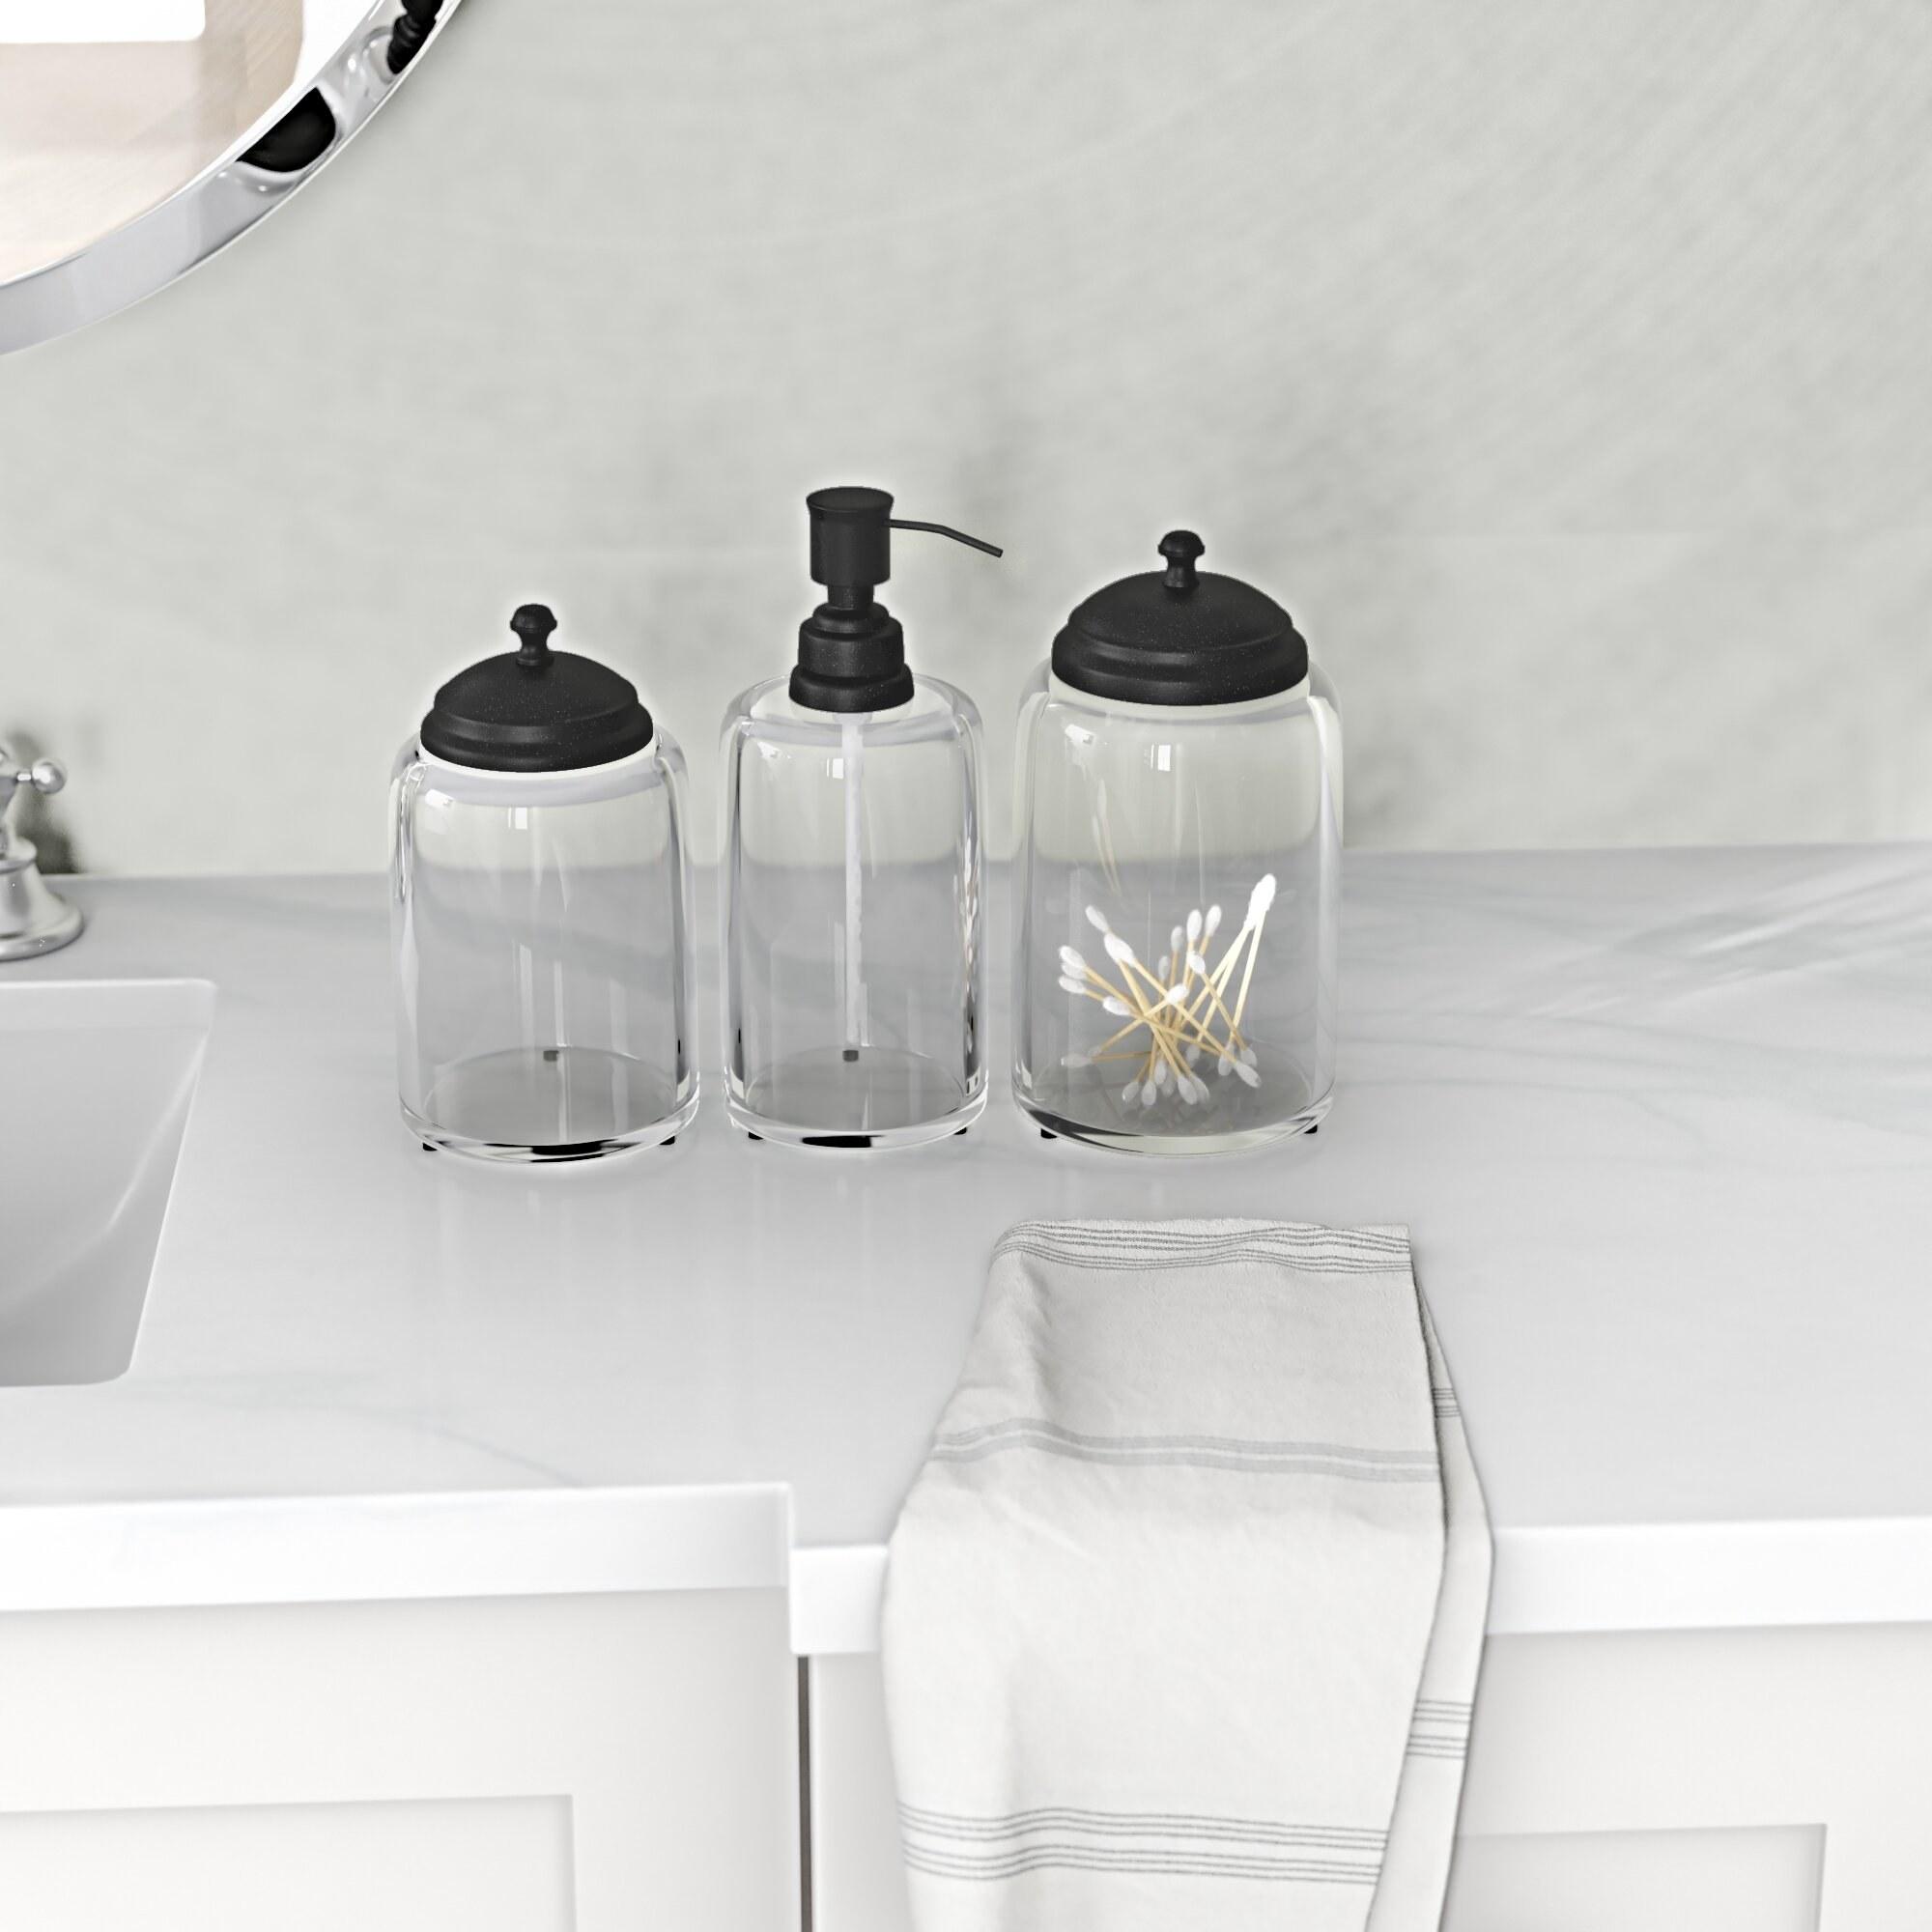 The bathroom set on a counter